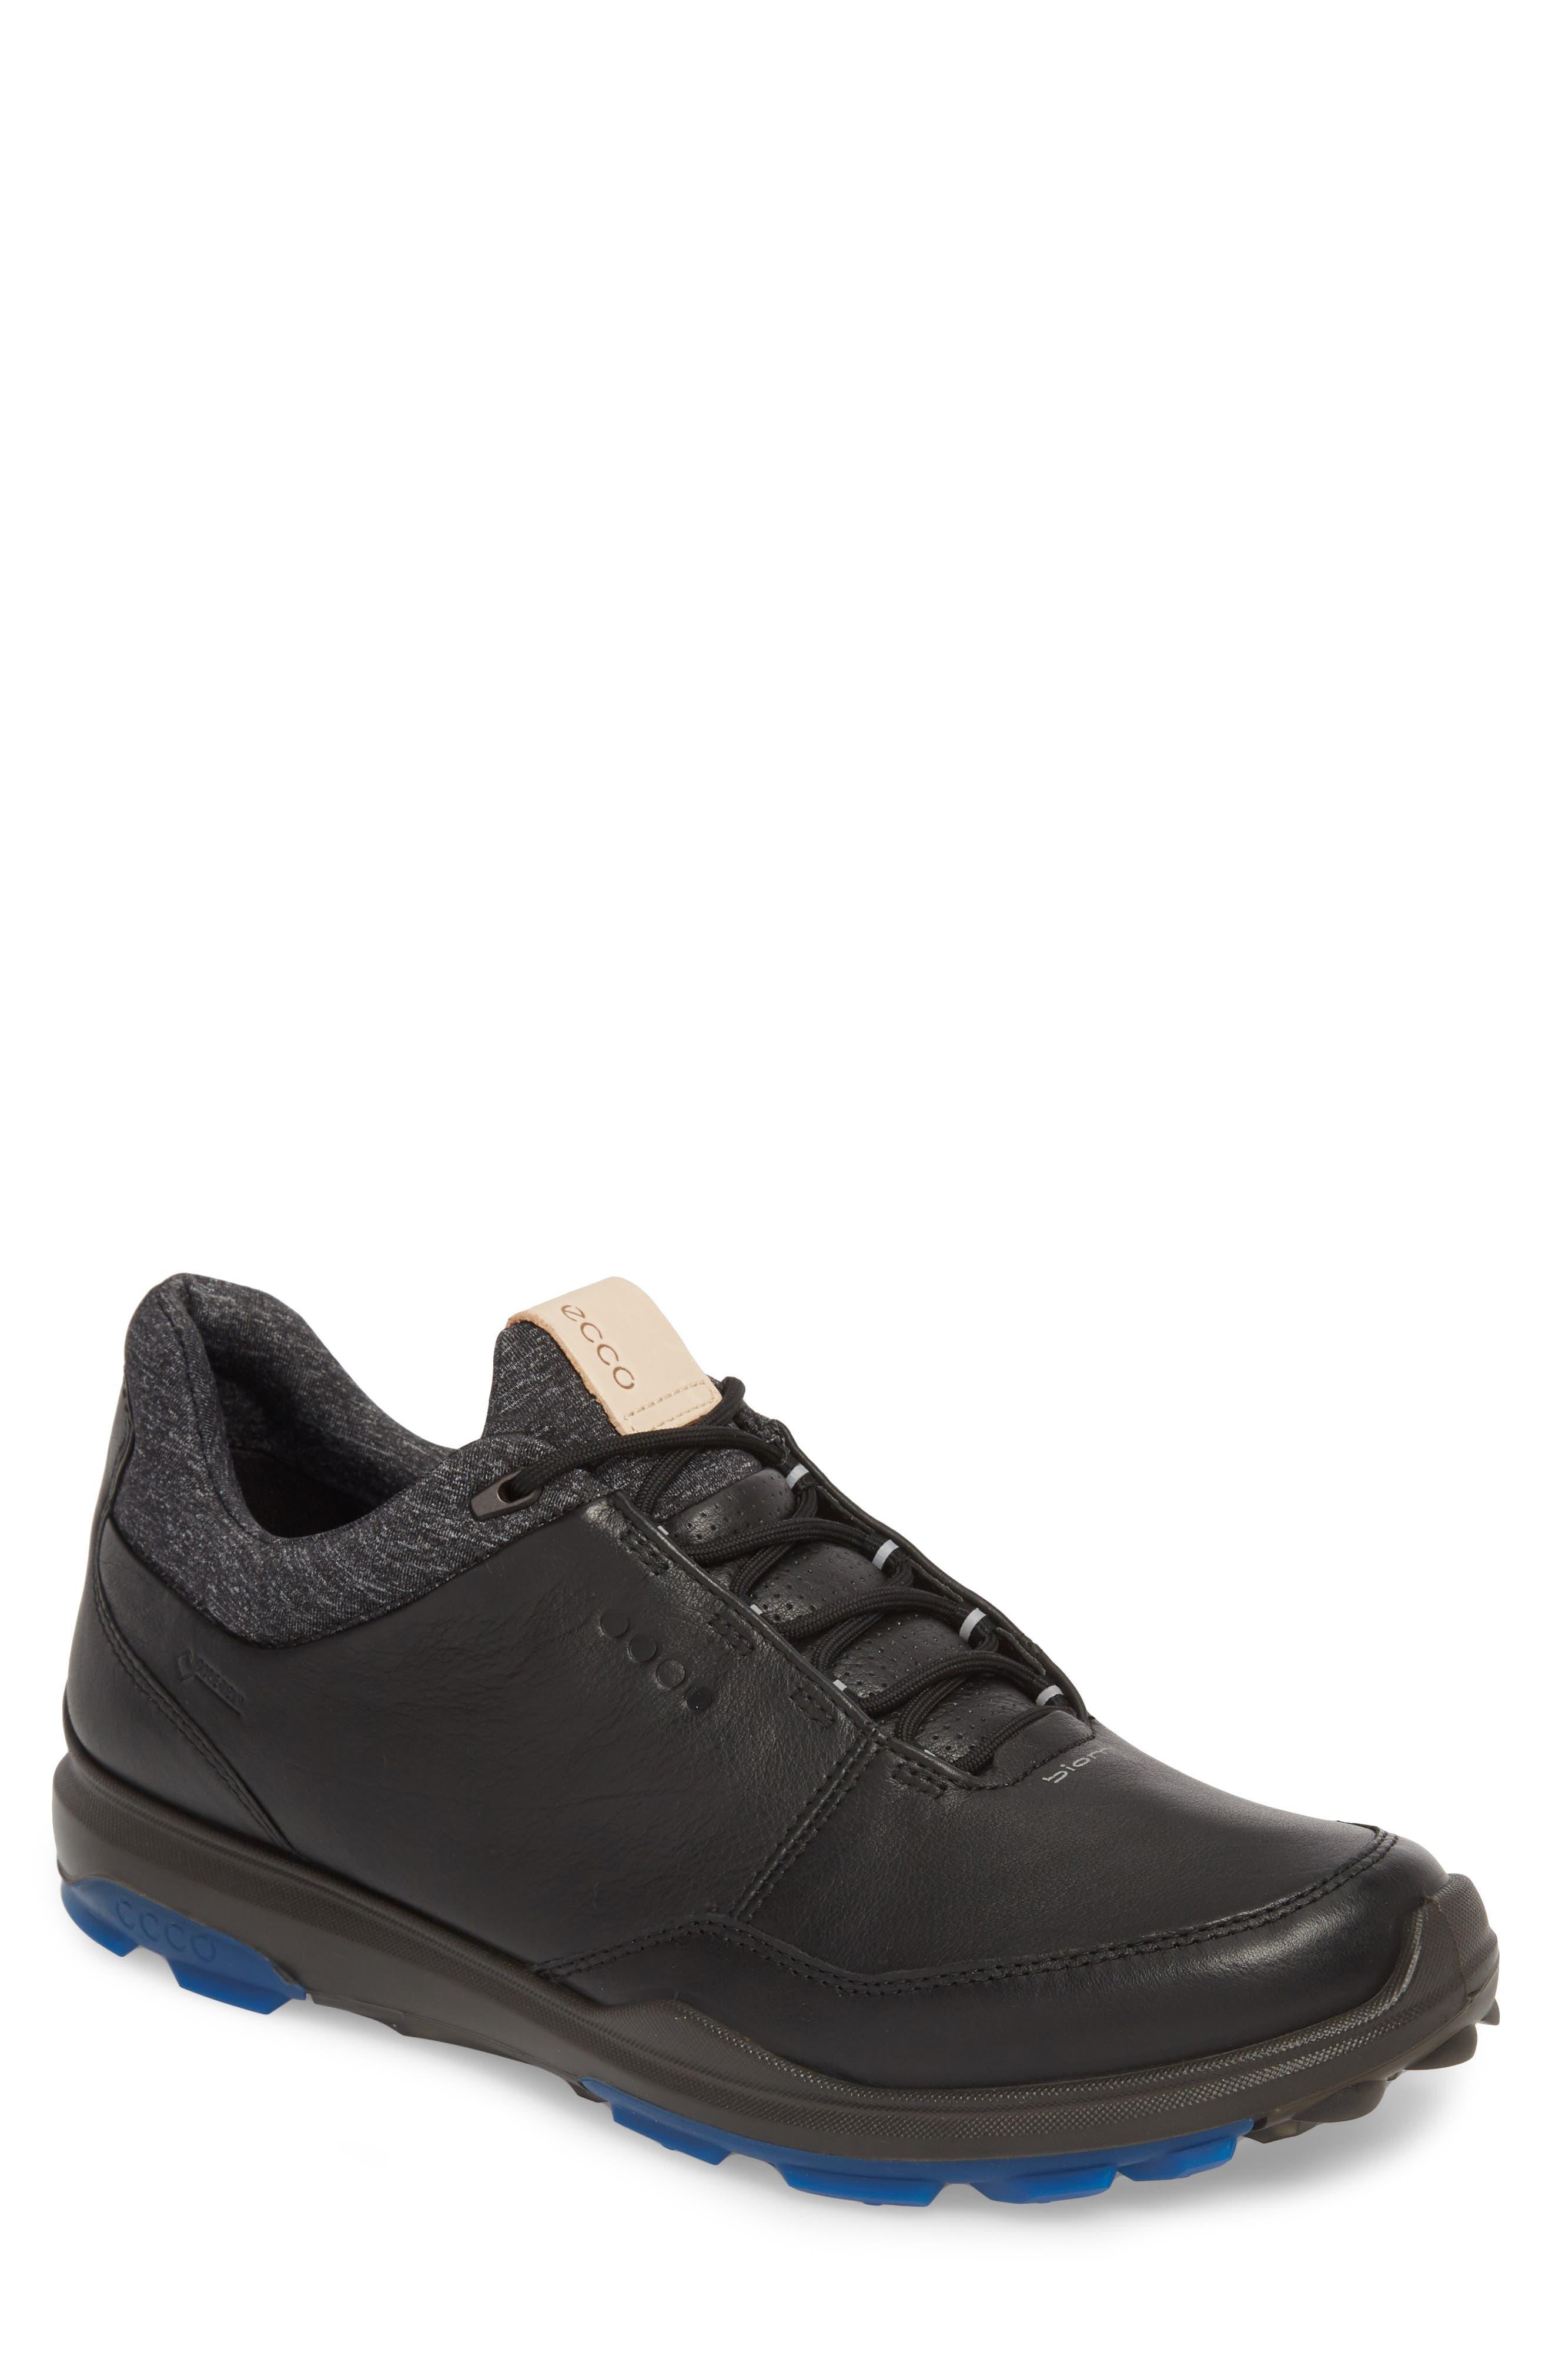 ECCO, BIOM Hybrid 3 Gore-Tex<sup>®</sup> Golf Shoe, Main thumbnail 1, color, BLACK/ BERMUDA BLUE LEATHER